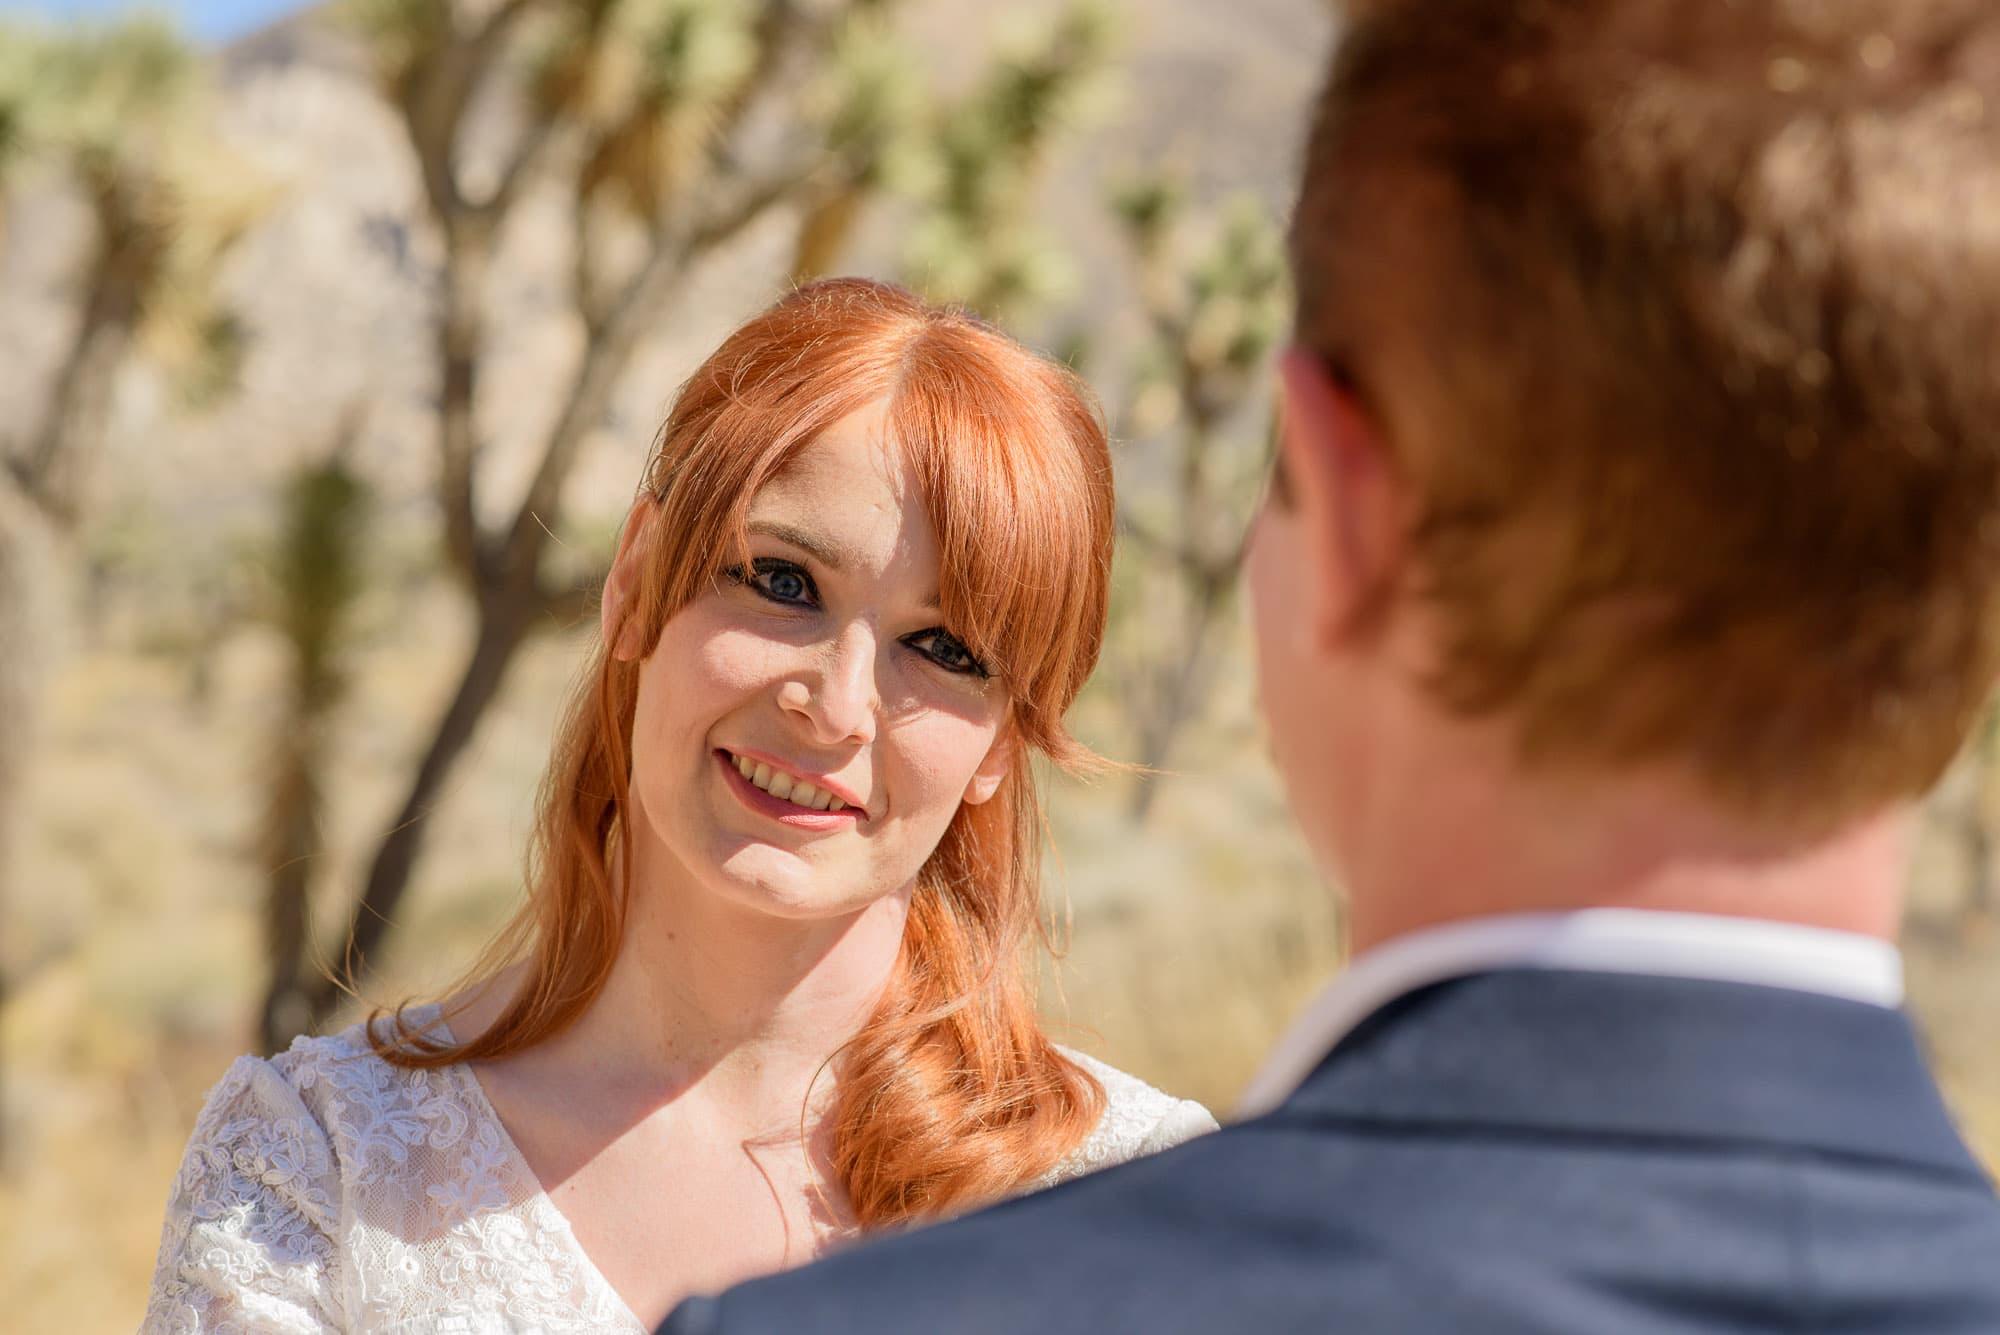 009_Alan_and_Heidi_Joshua_Tree_Destination_Wedding